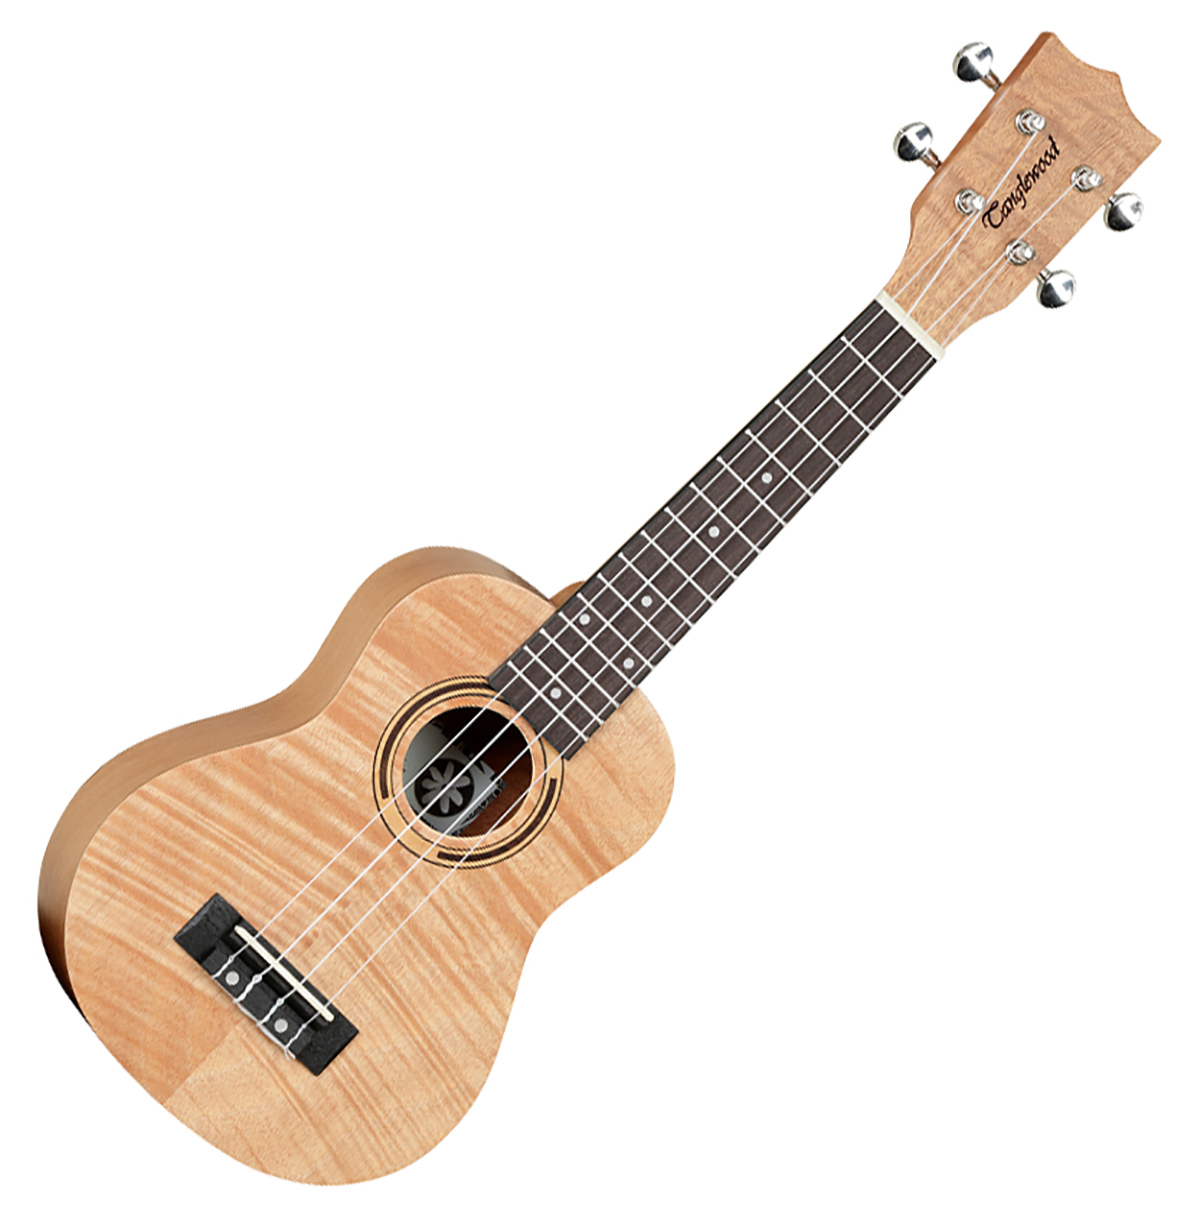 Tanglewood Tiare sopran ukulele